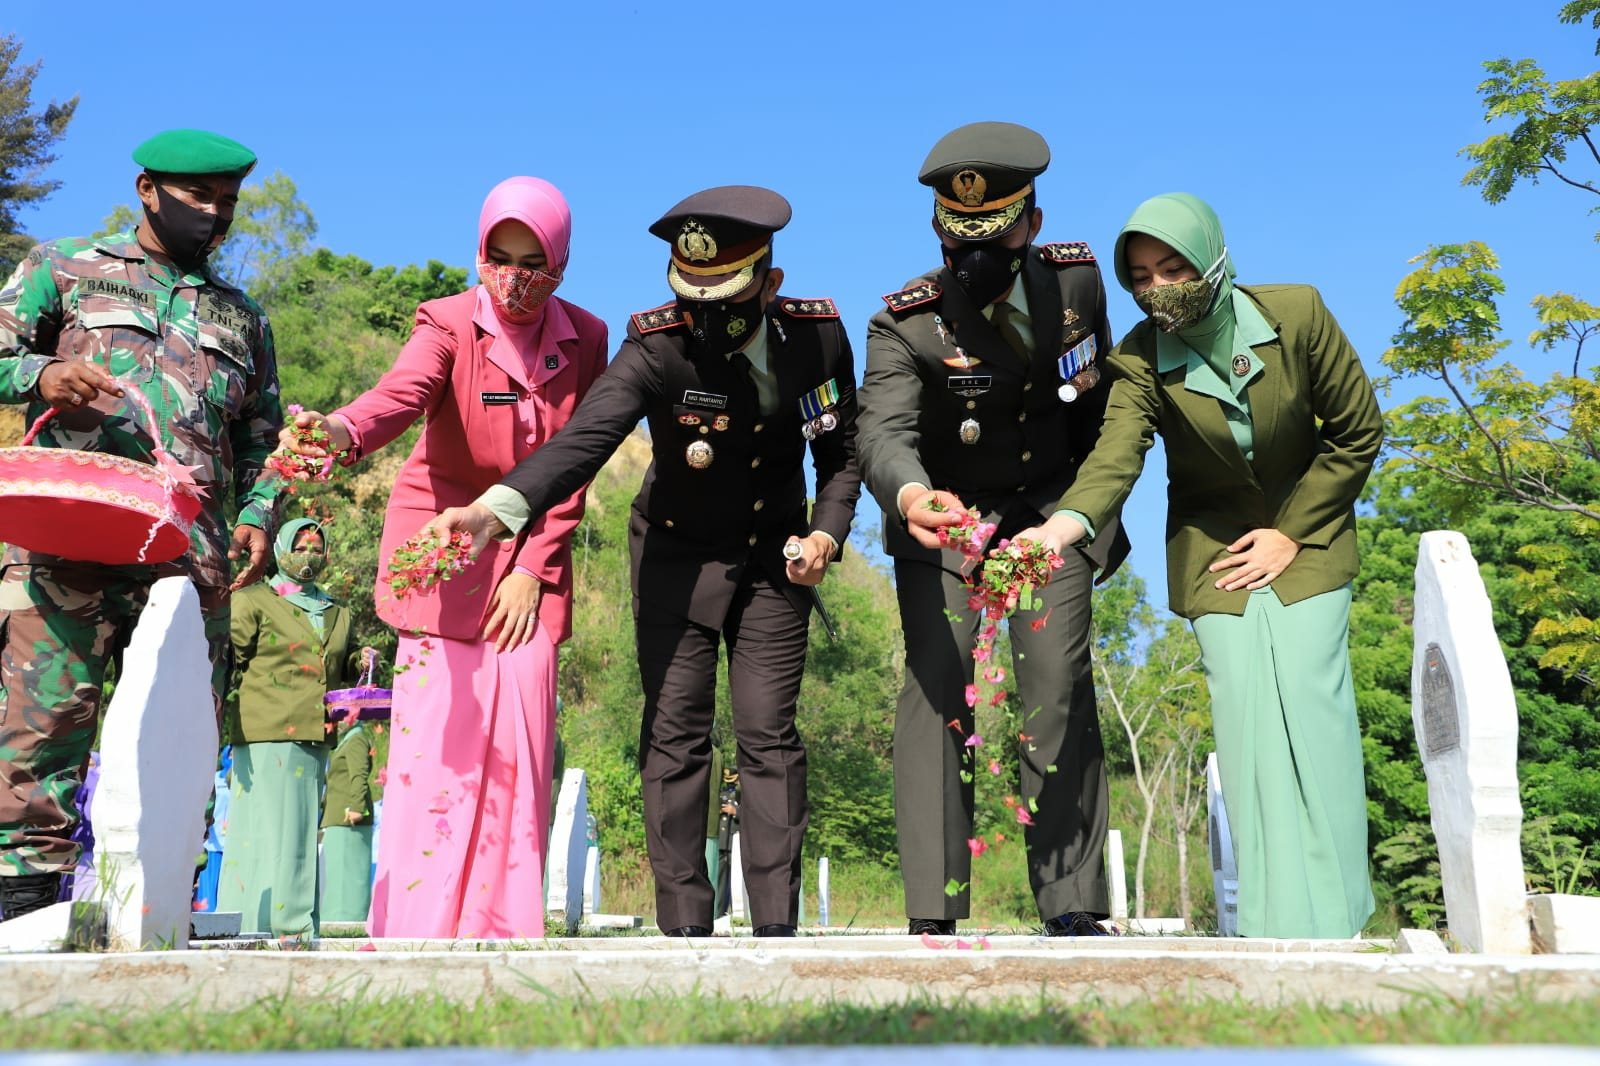 Dalam rangka HUT ke 76 TNI, Kapolres Lhokseumawe Bersama Dandim Aceh Utara Ziarah dan Tabur Bunga di TMP Blang Panyang